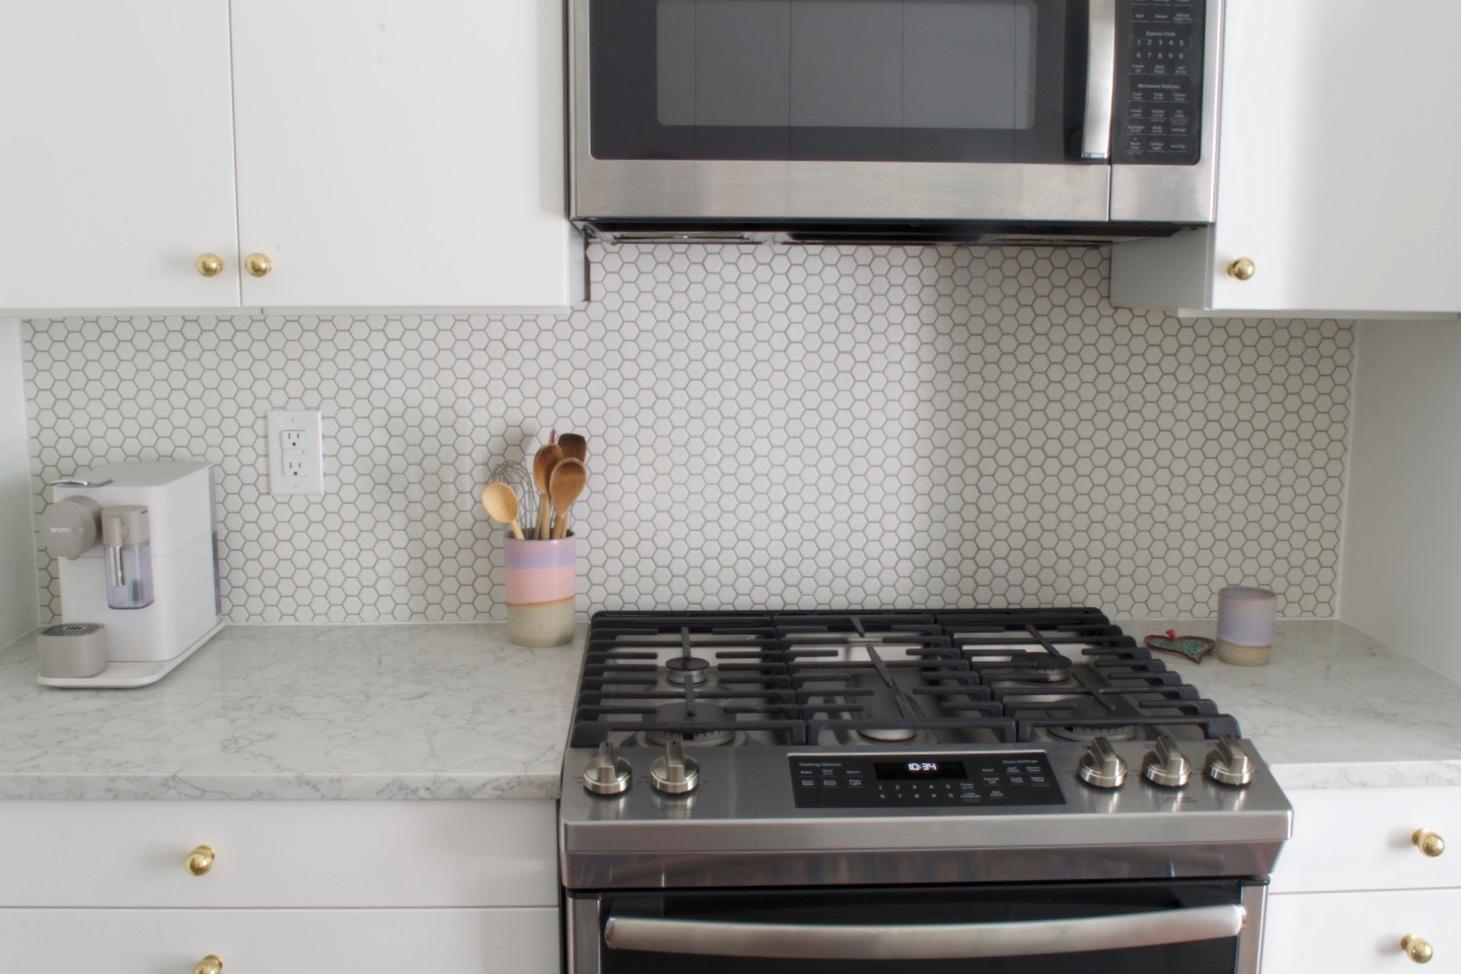 Kitchen-remodel-before-after7.jpg